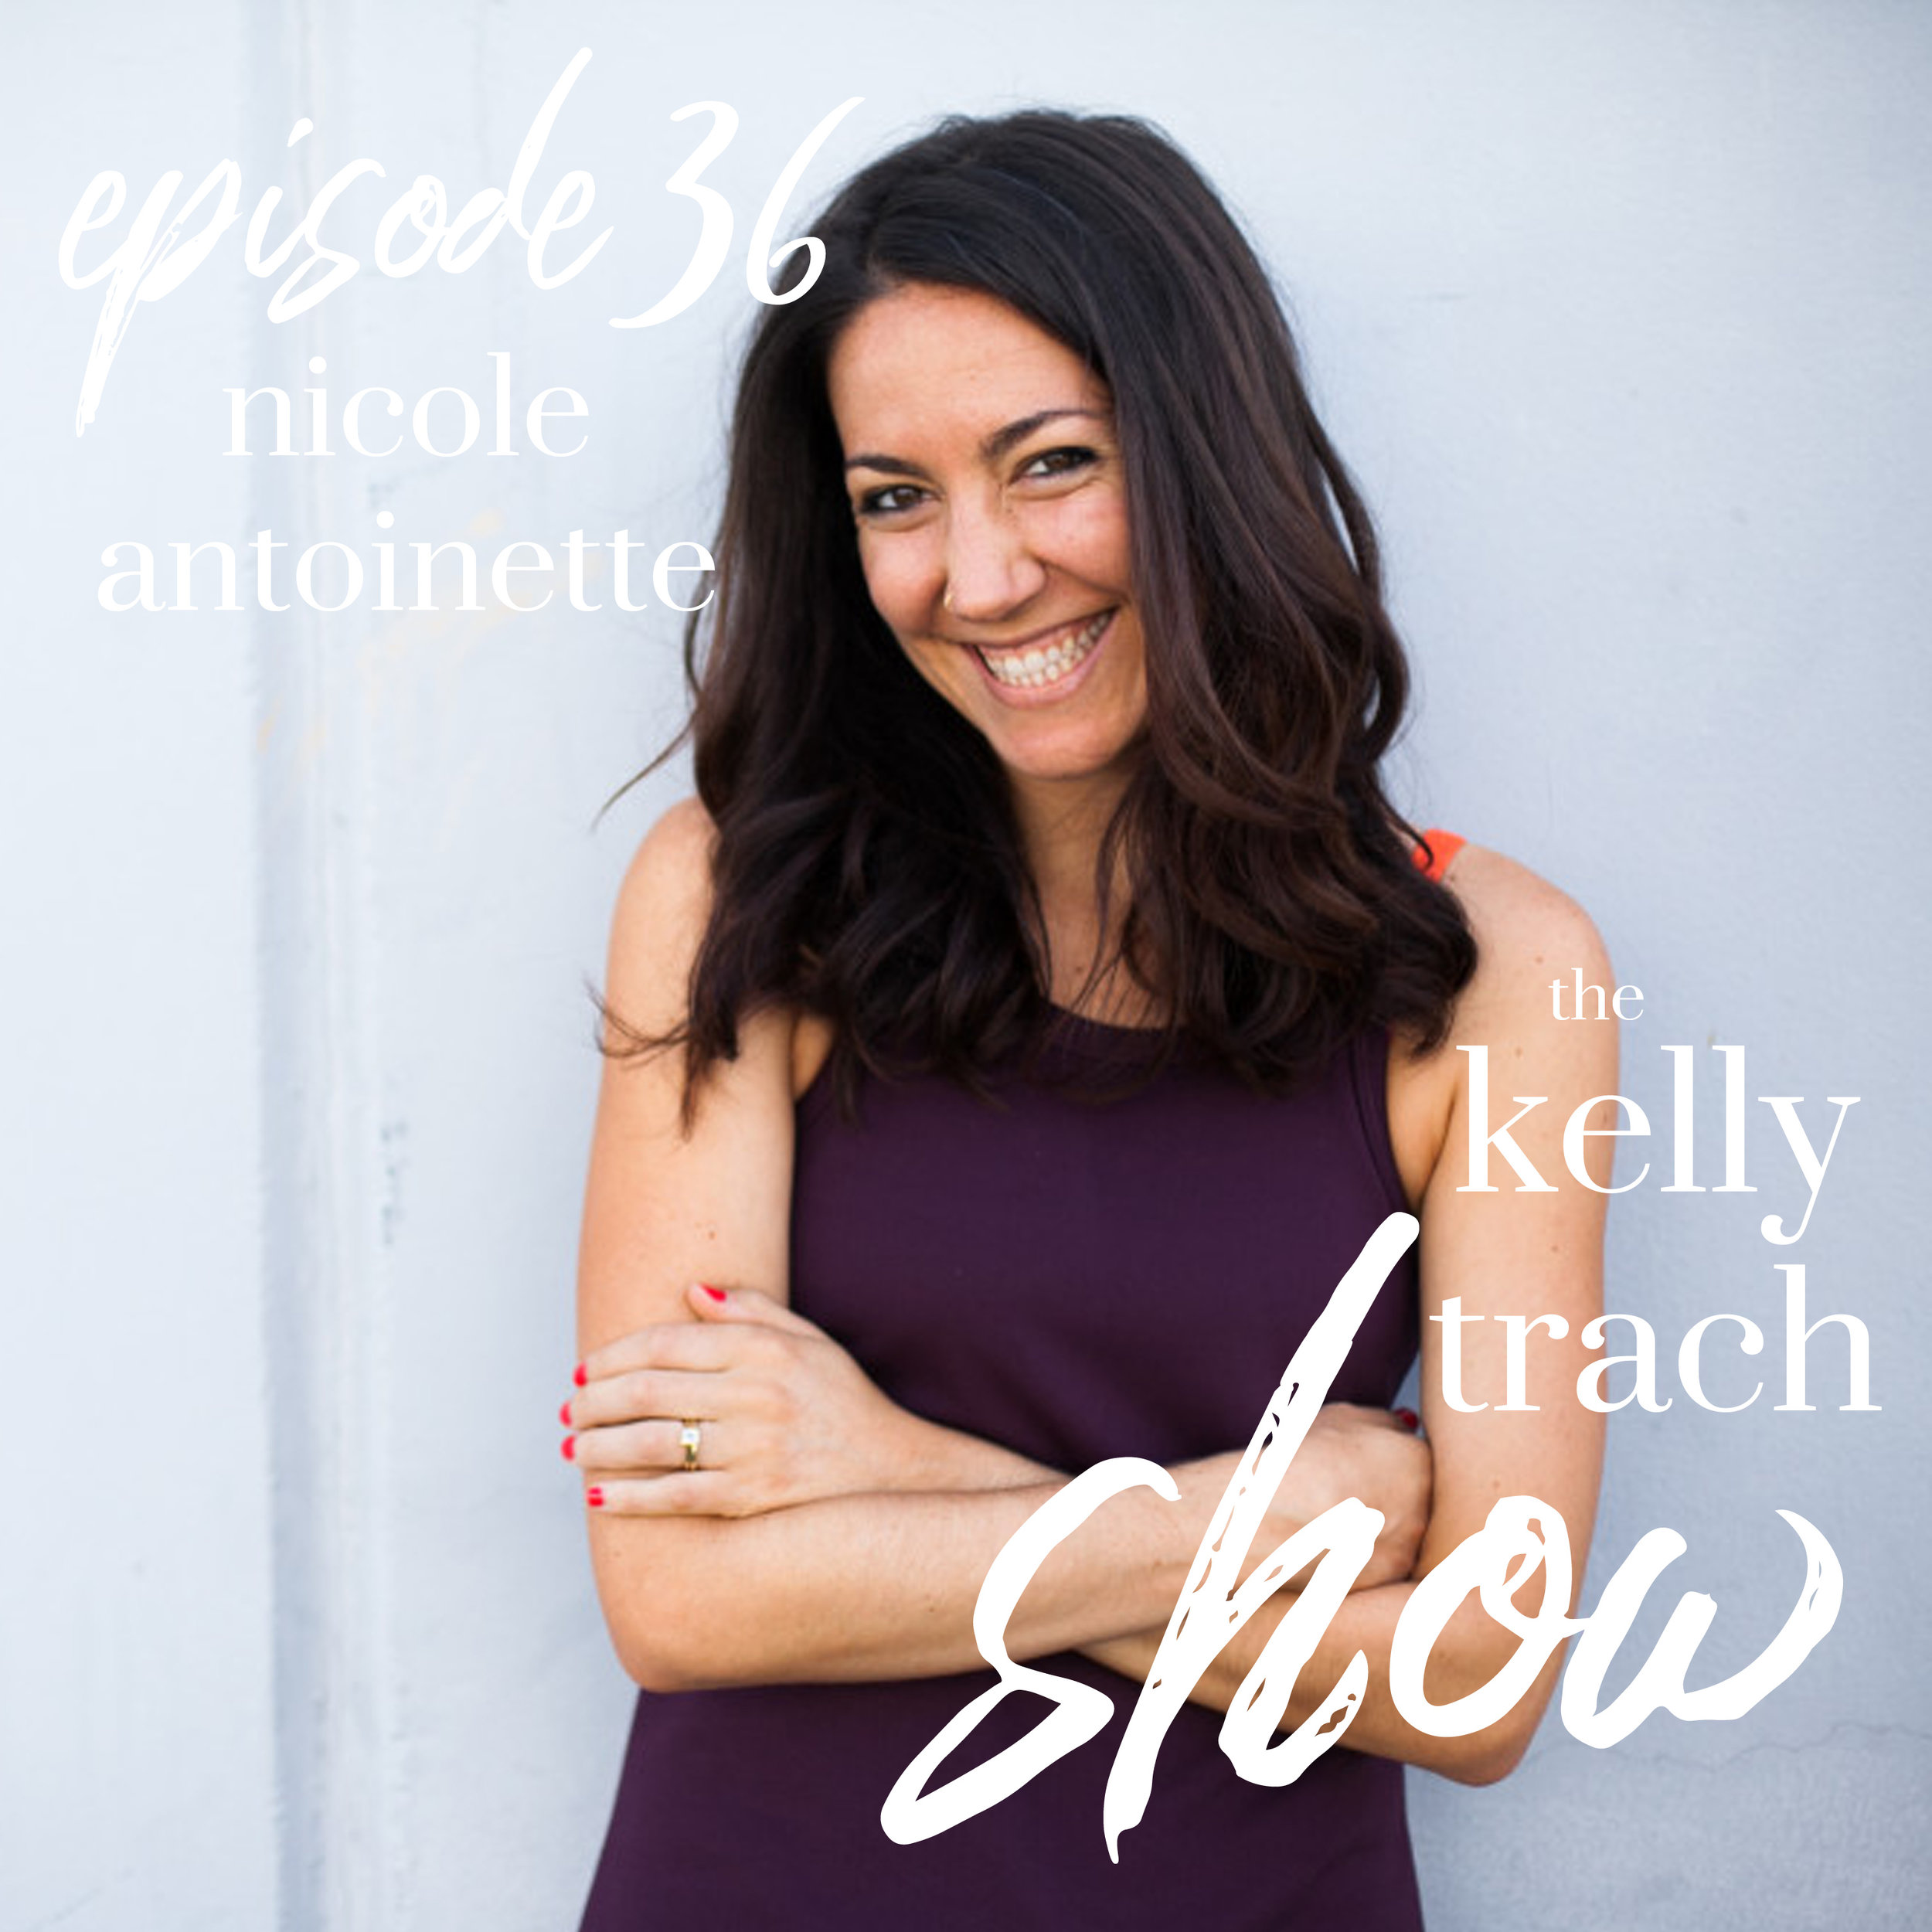 36 - Nicole Antoinette - The Kelly Trach Show.jpg